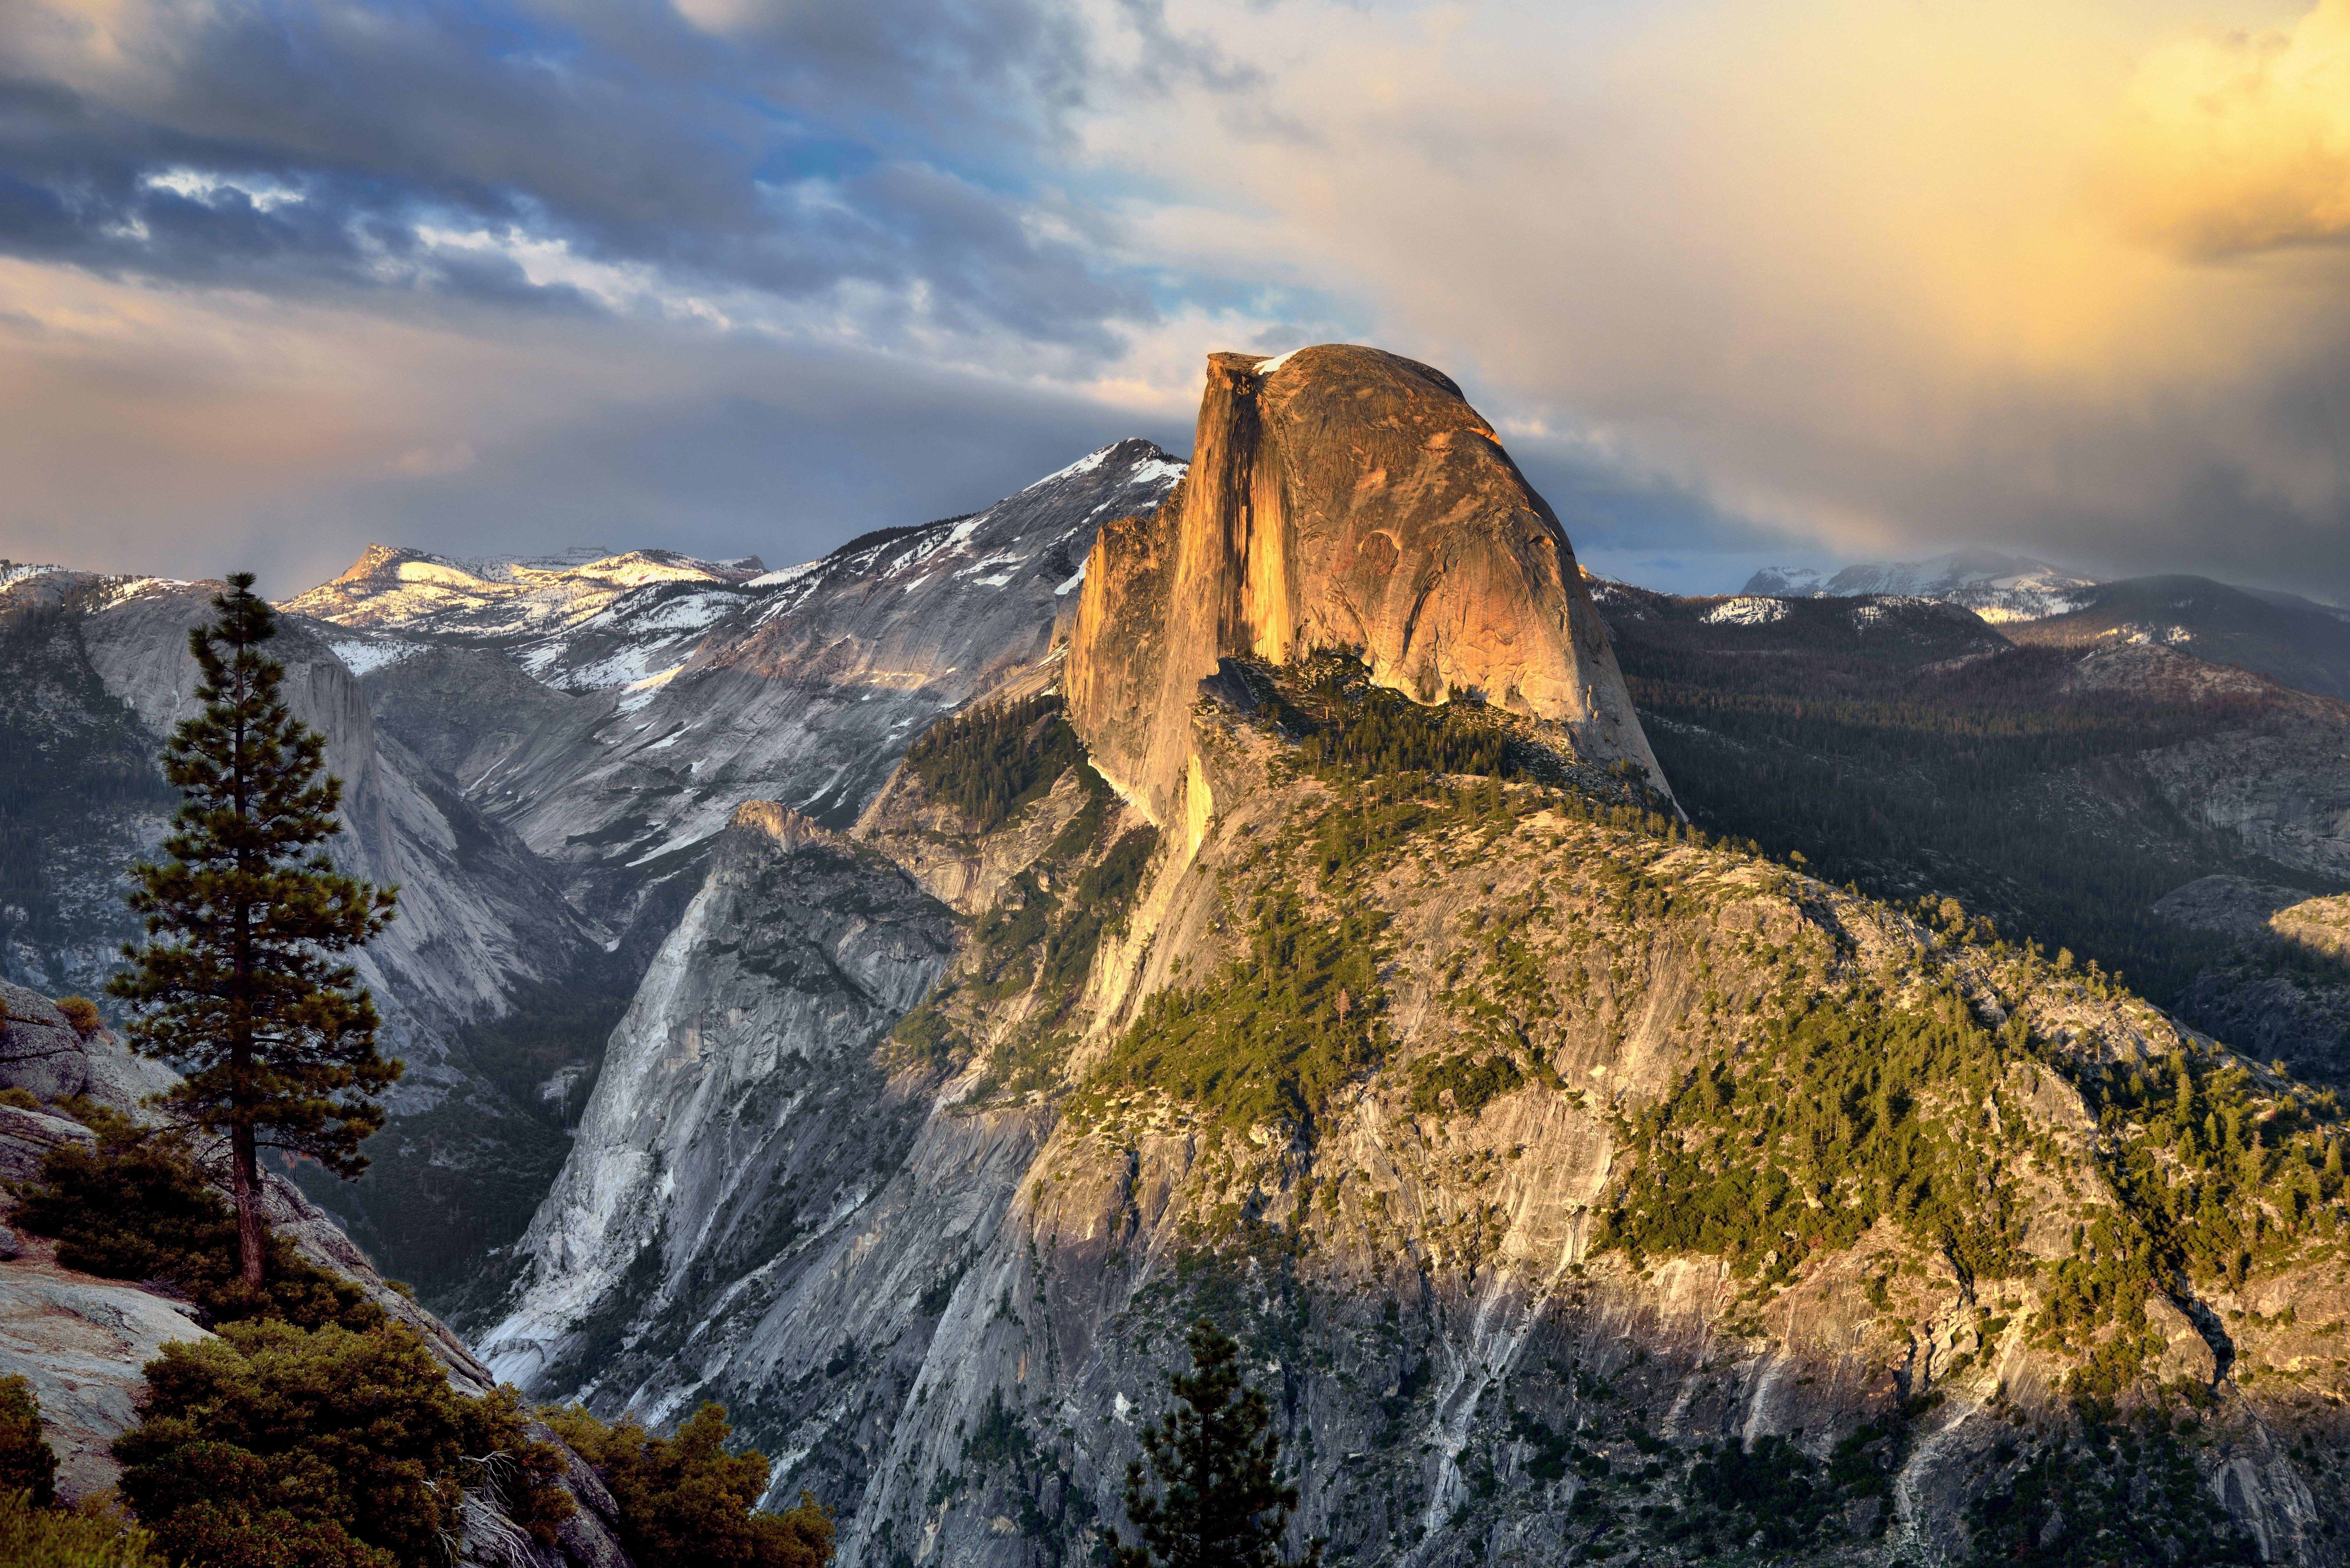 Yosemite National Park Wallpapers Top Free Yosemite National Park Backgrounds Wallpaperaccess